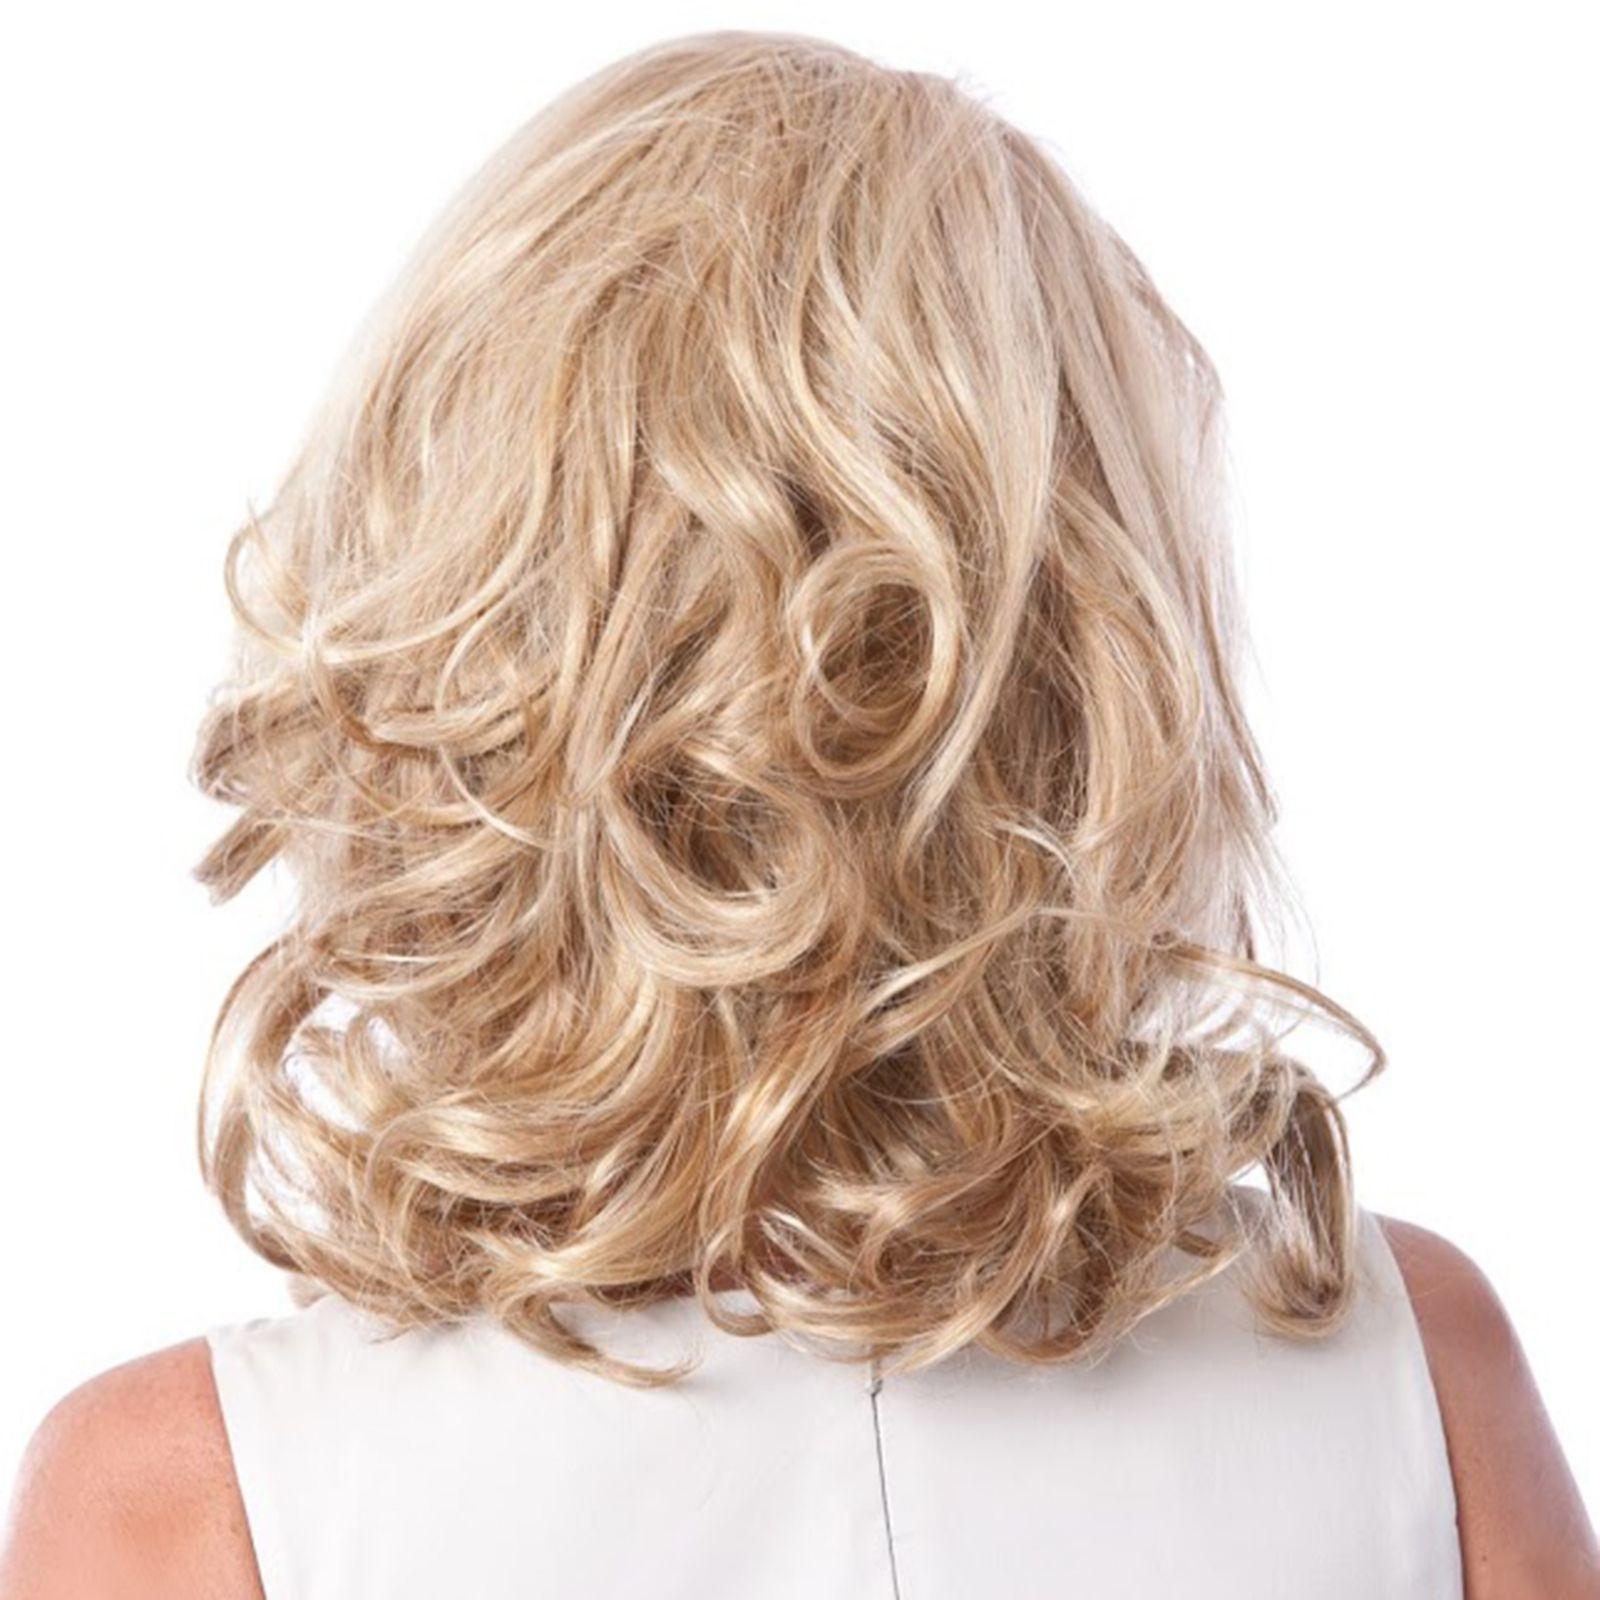 Toni Brattins Hair Fabulous 2 Piece 85 Extension Curls Page 1